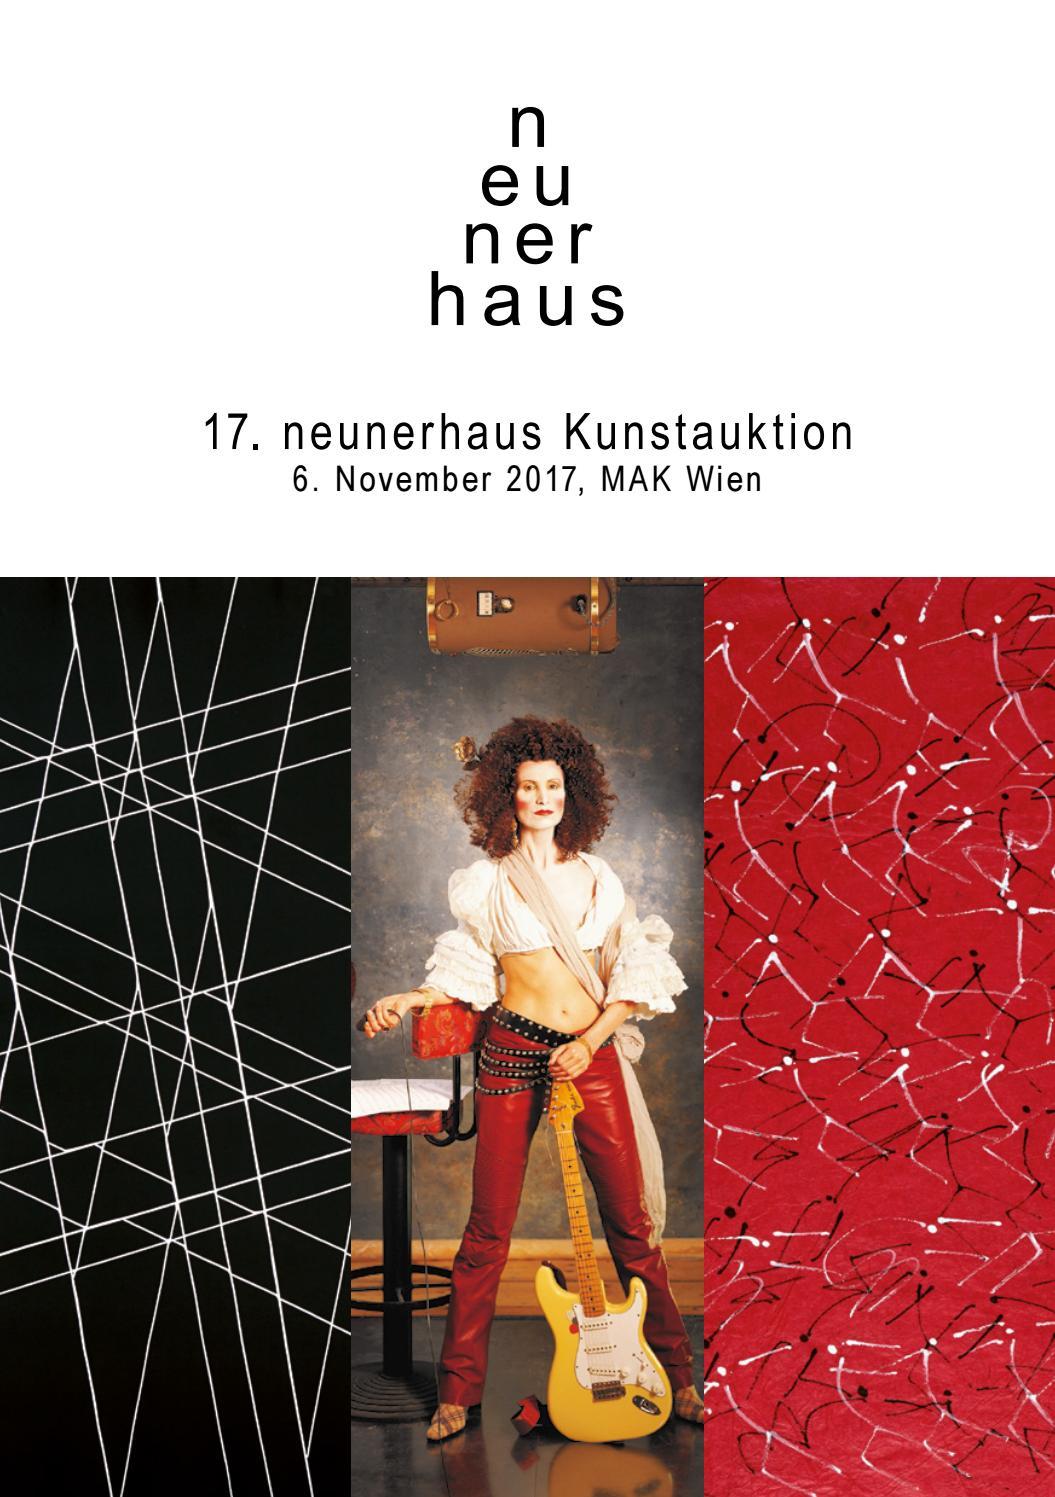 Katalog der 17. neunerhaus Kunstauktion 2017 by neunerhaus - issuu